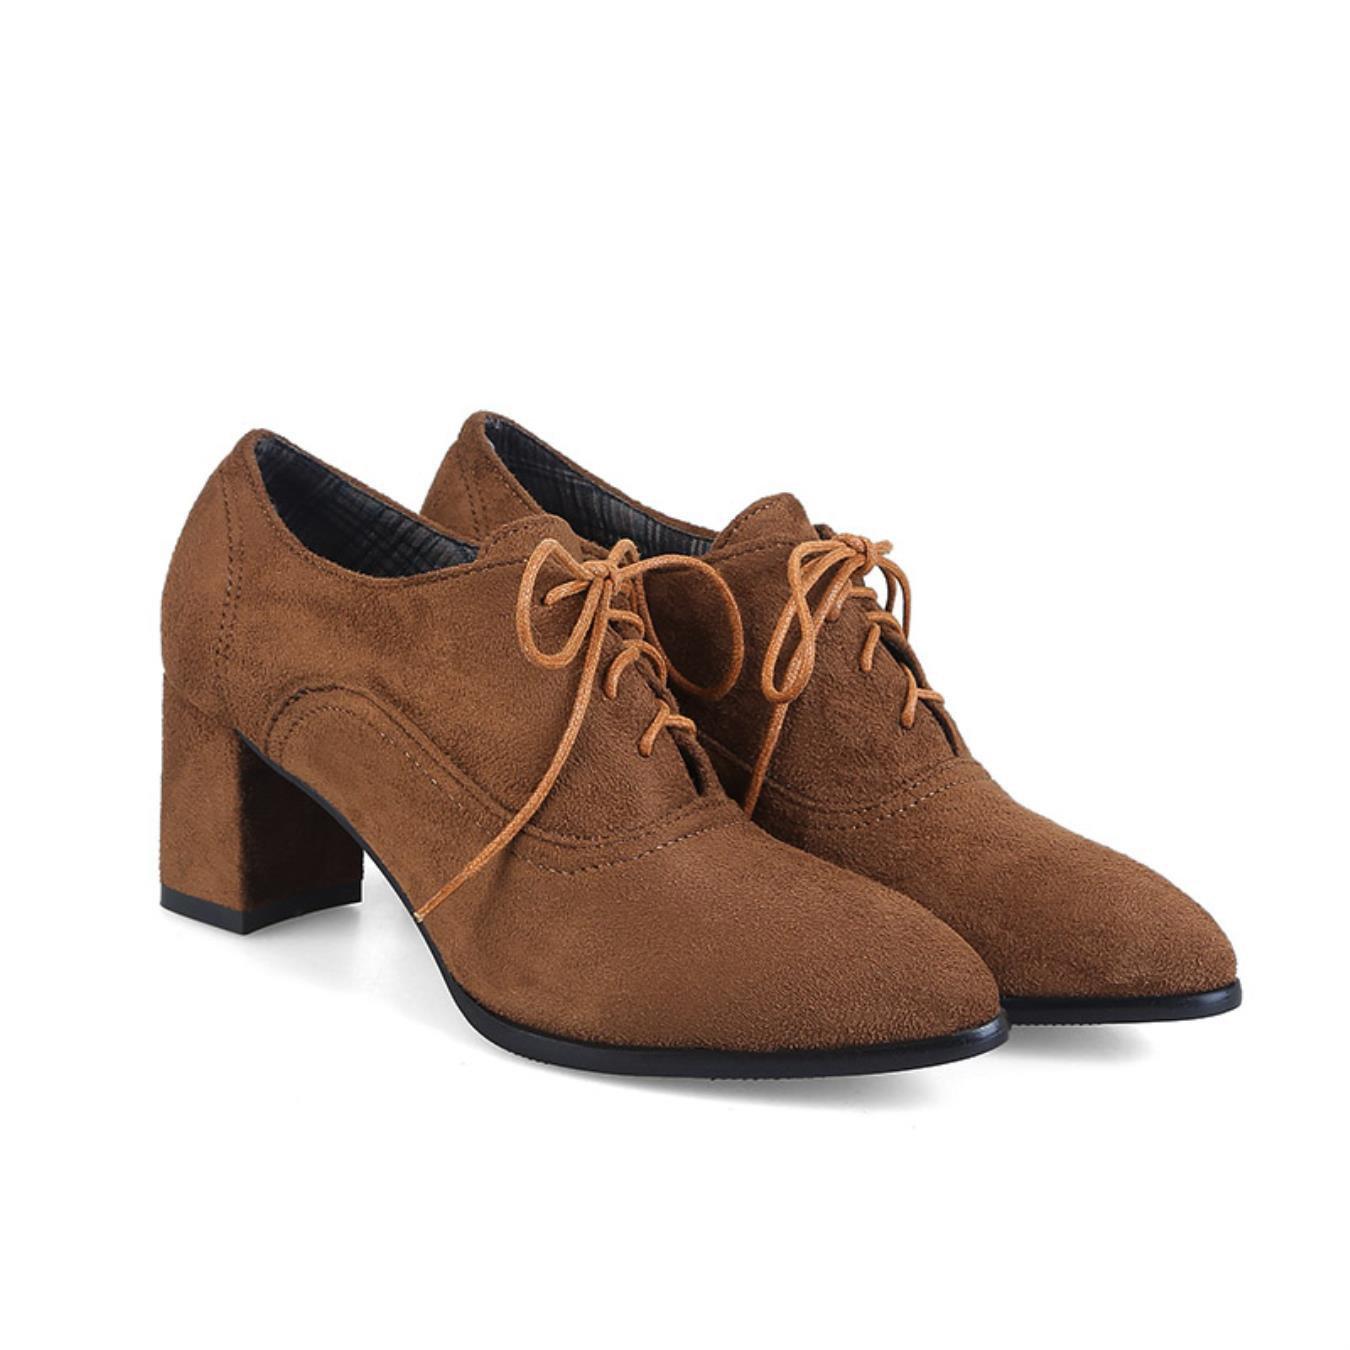 Phoentin lace up women shoes high heel 6cm square flock shoe woman heel cotton fabric inside spring autumn pump